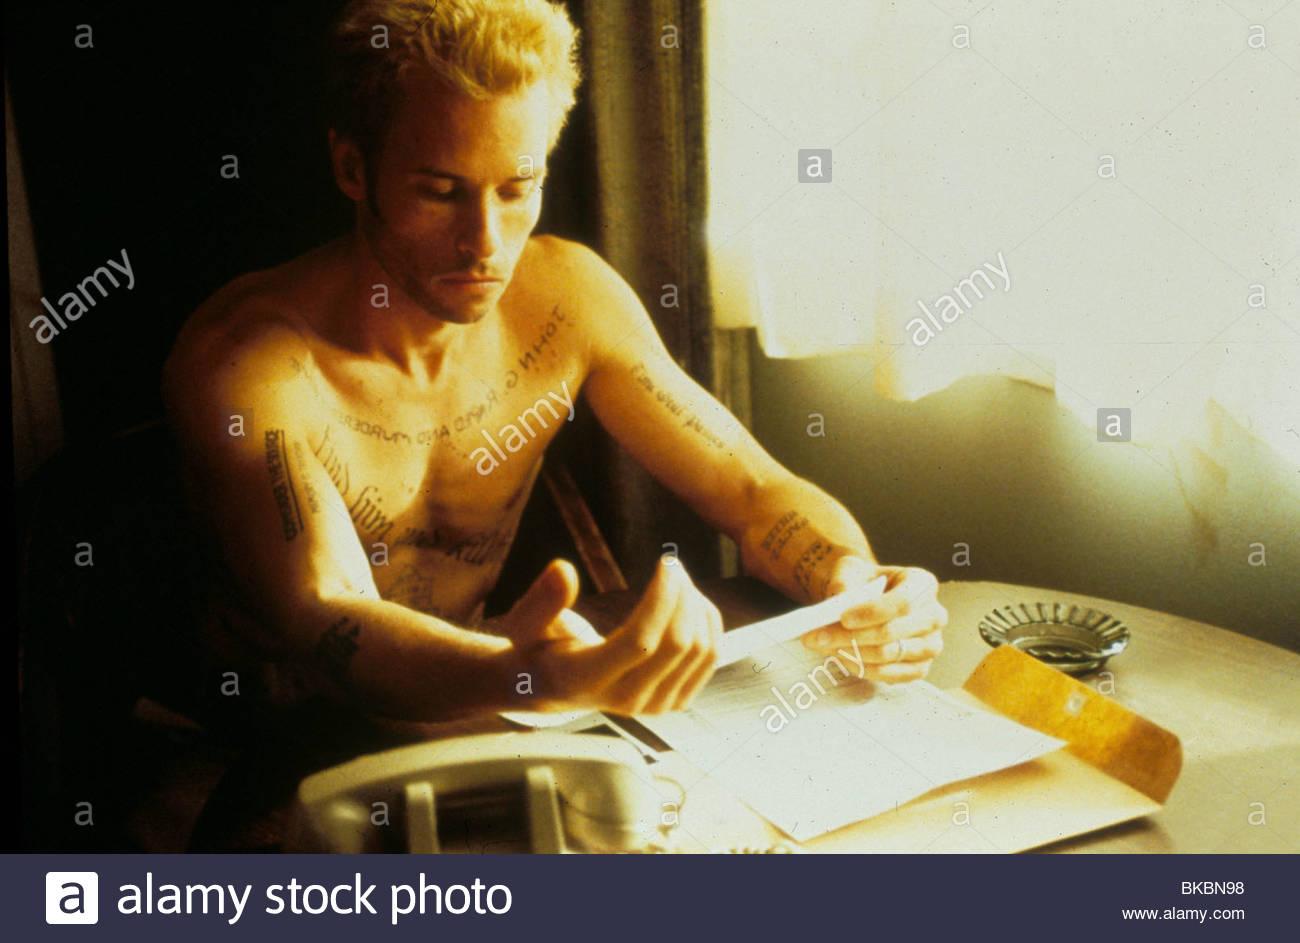 MEMENTO -2000 GUY PEARCE - Stock Image